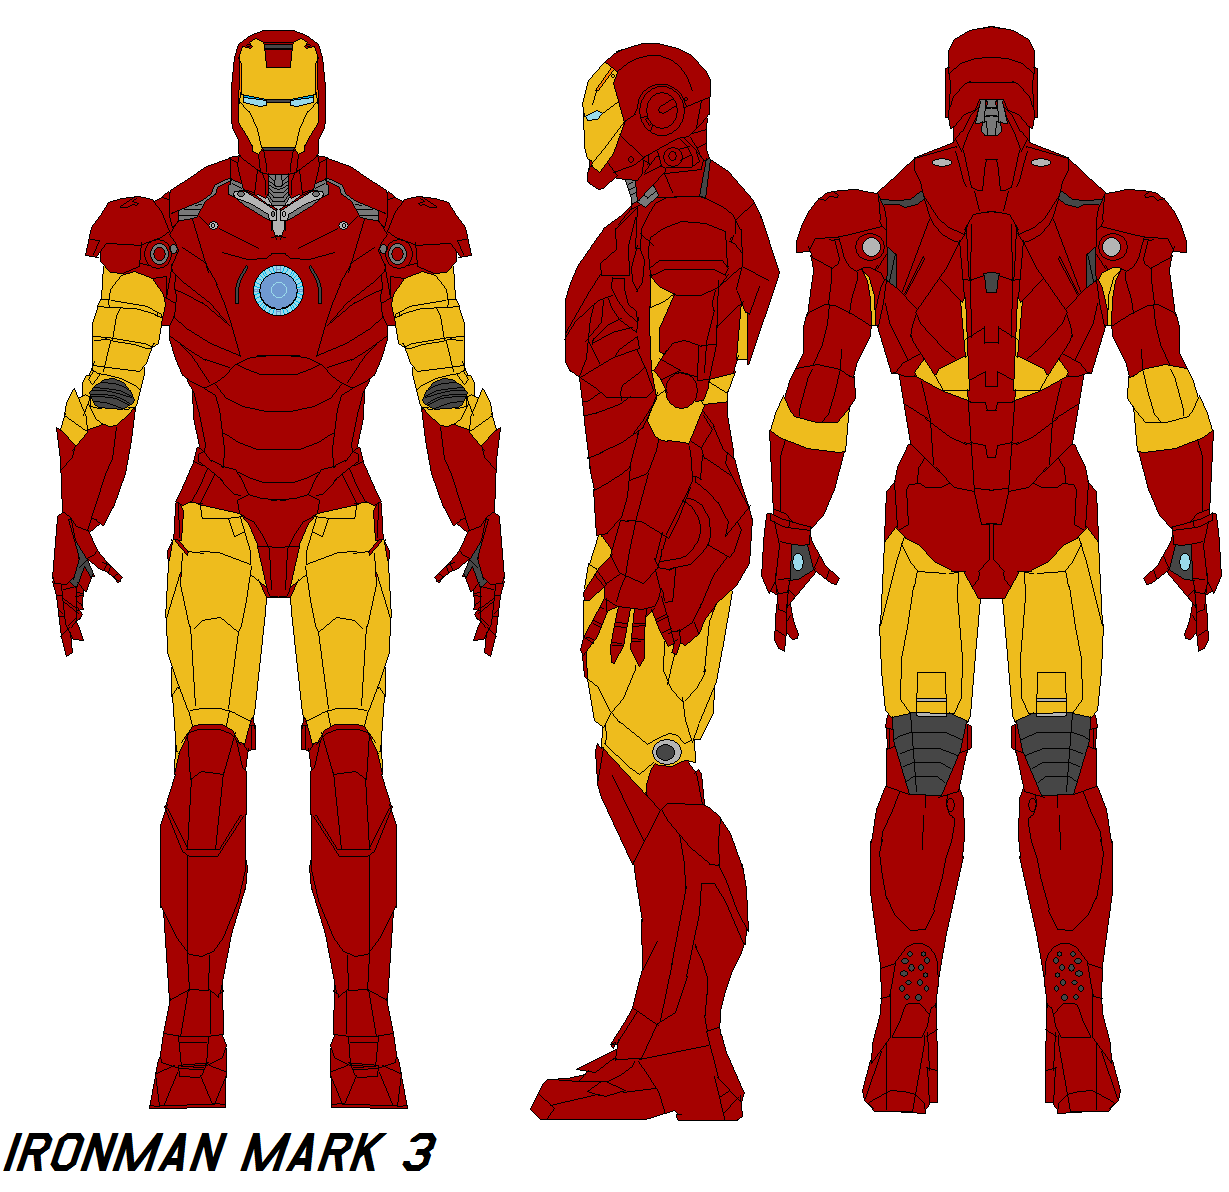 ironman mark 3 armor by bagera3005 on DeviantArt